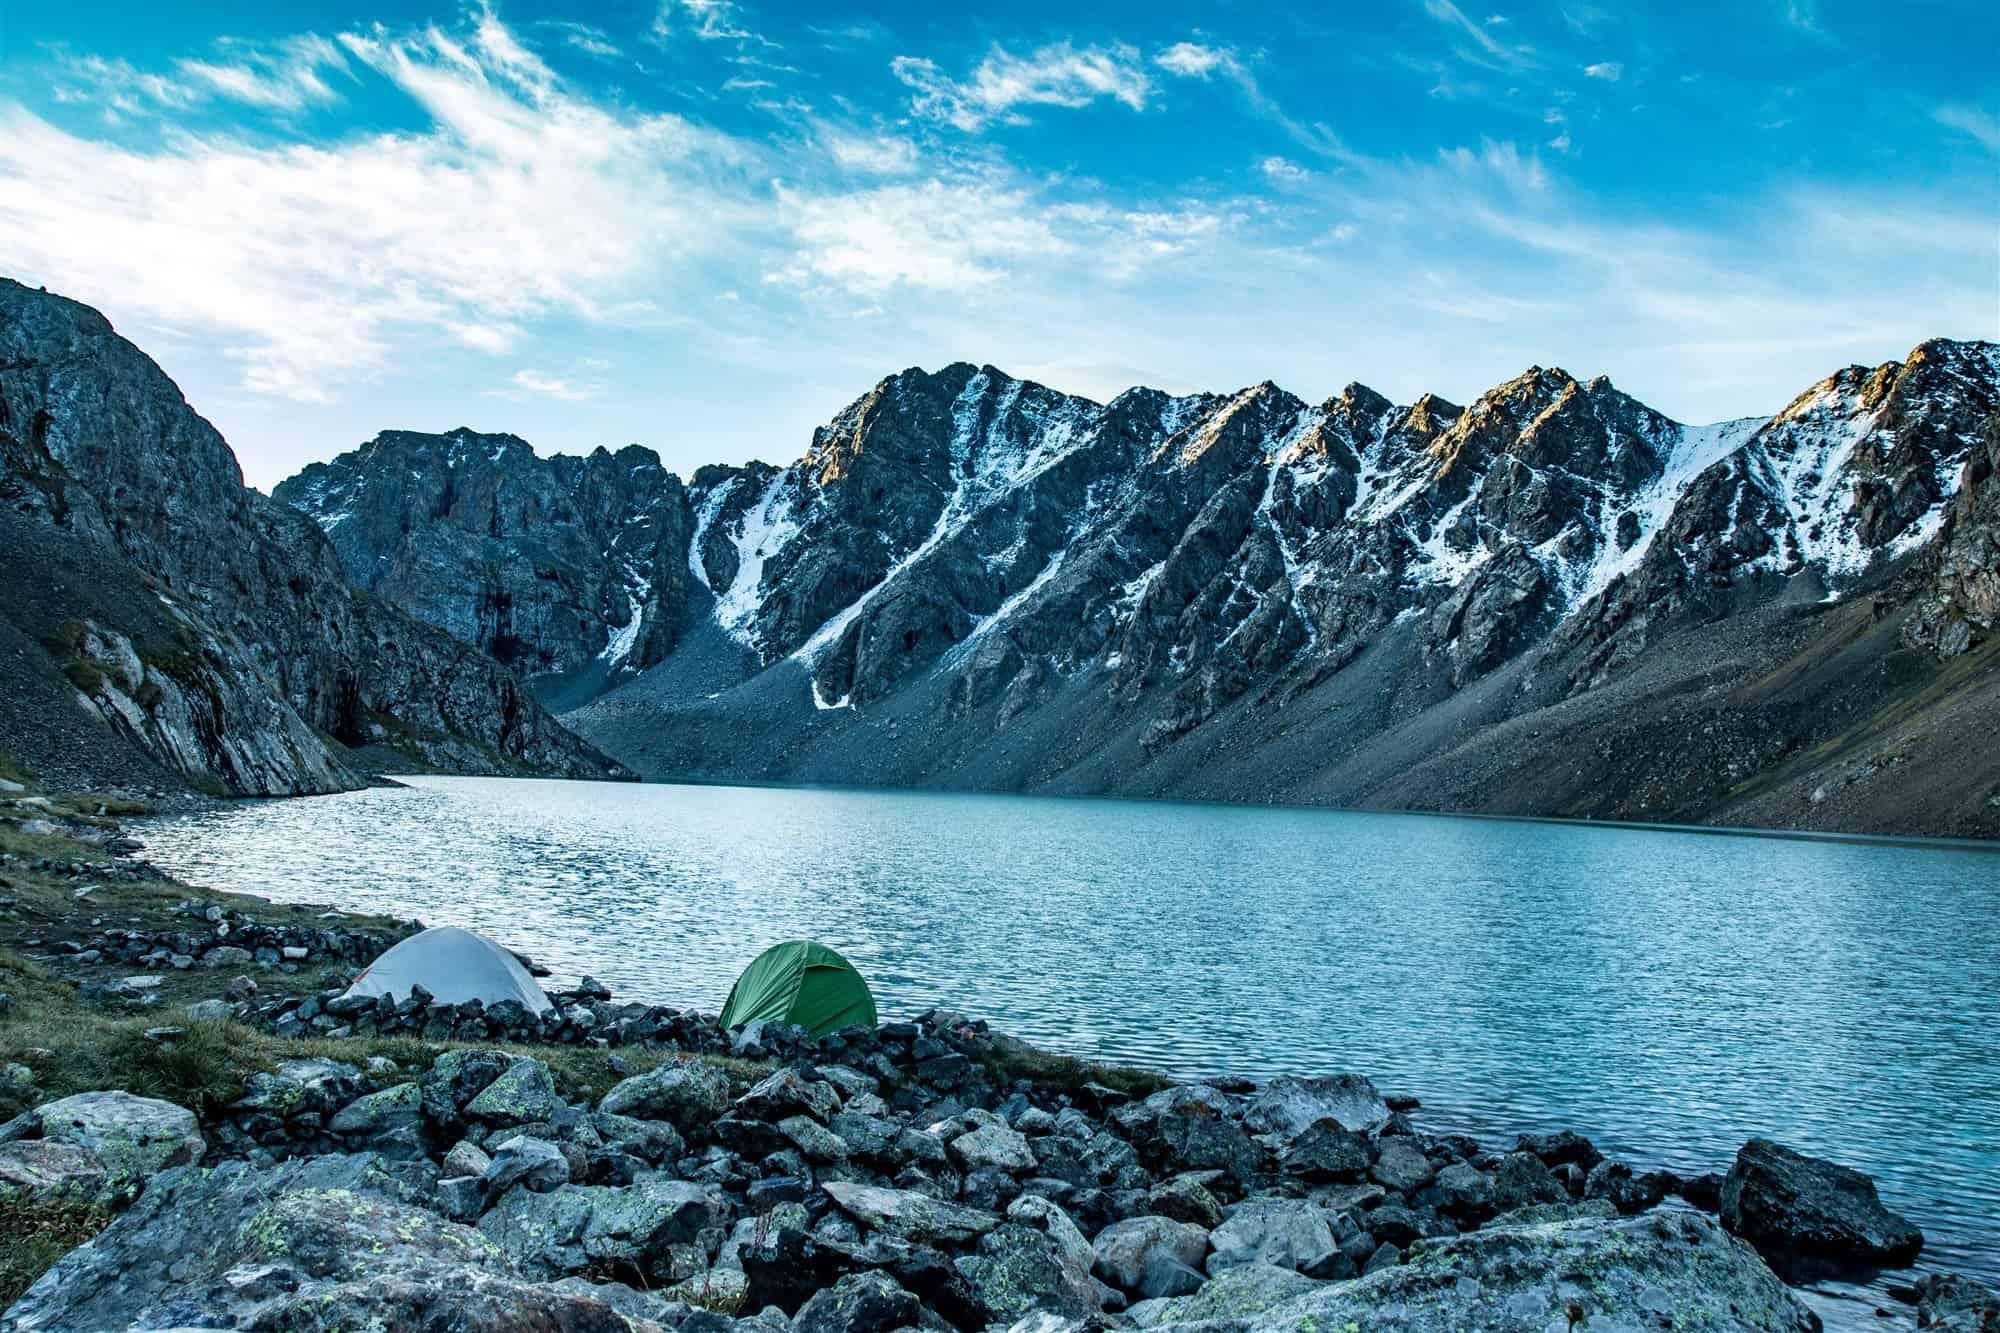 Alakul lake